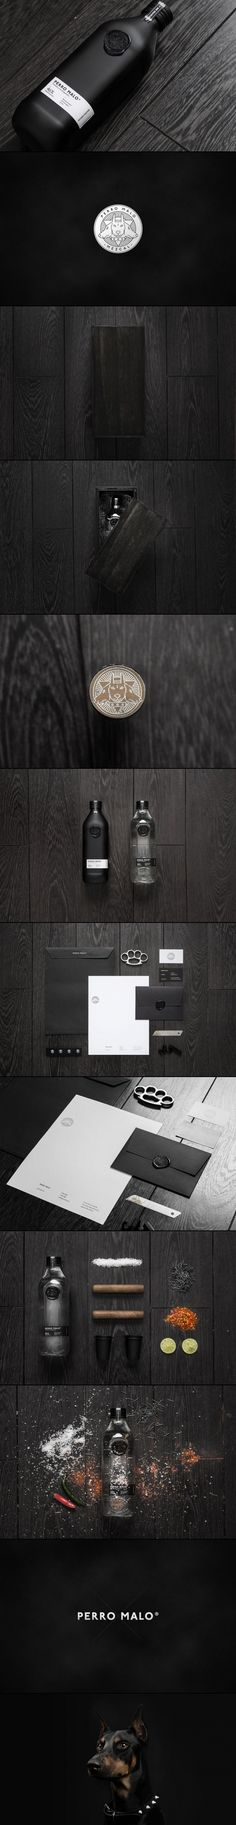 Perro Malo study in black #identity #packaging #branding PD